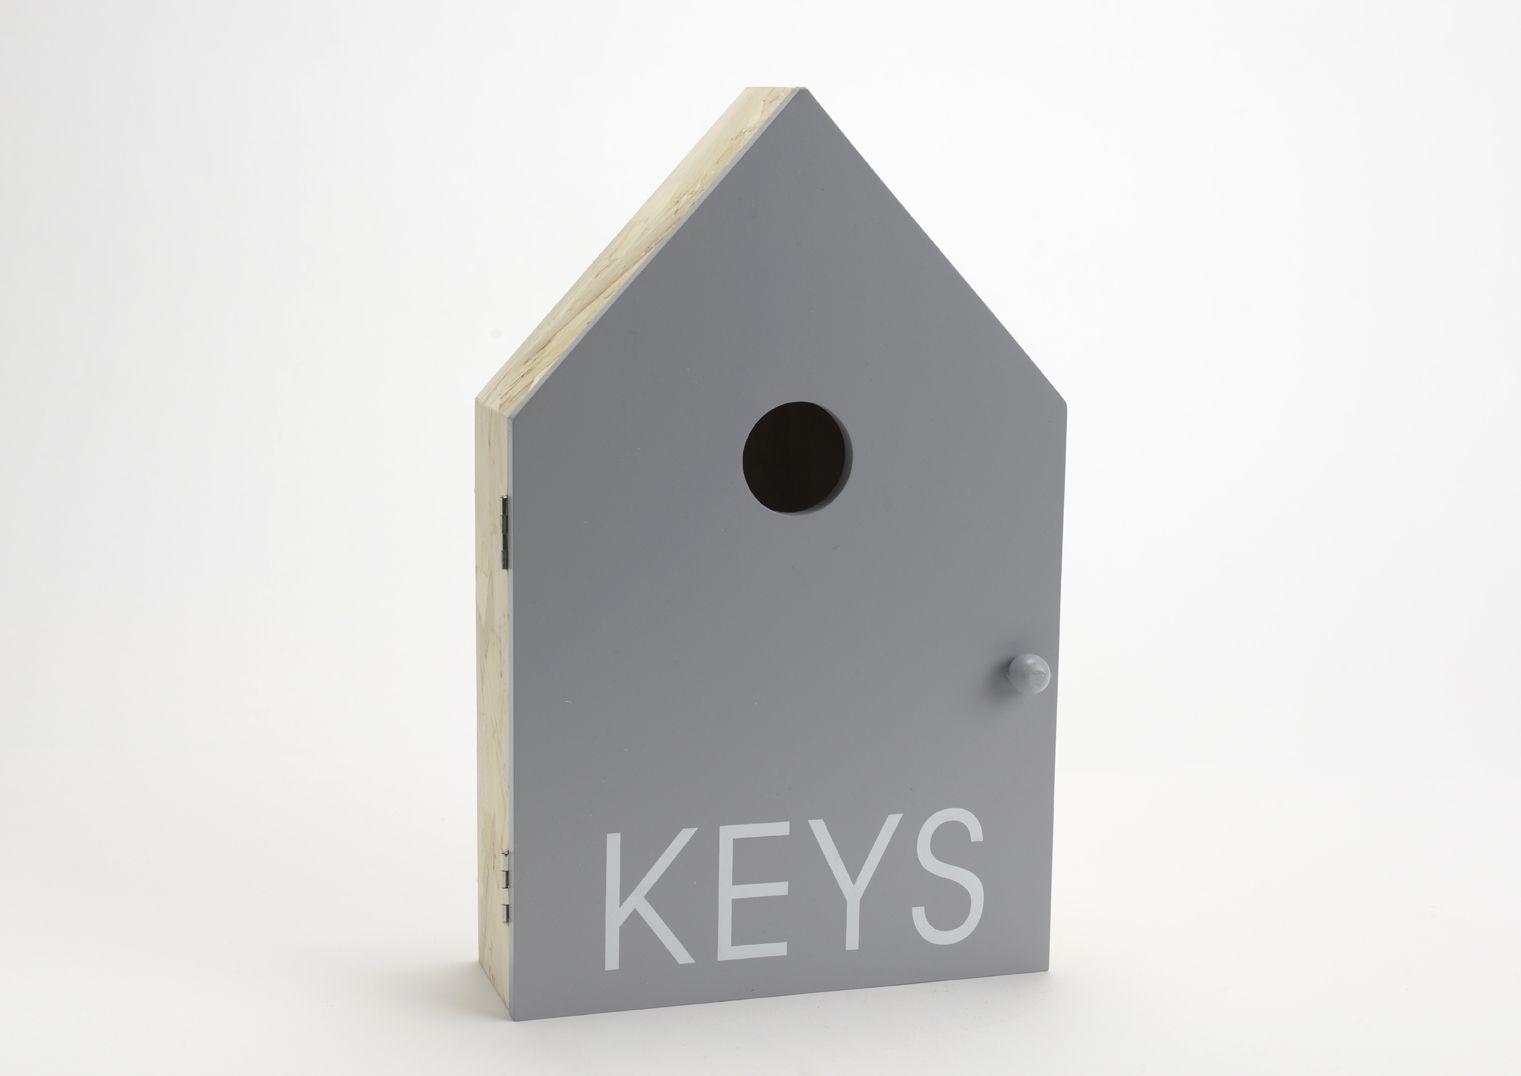 coffre cls scuris select access masterlock gallery of coffre a clef code coffre clefs mini. Black Bedroom Furniture Sets. Home Design Ideas